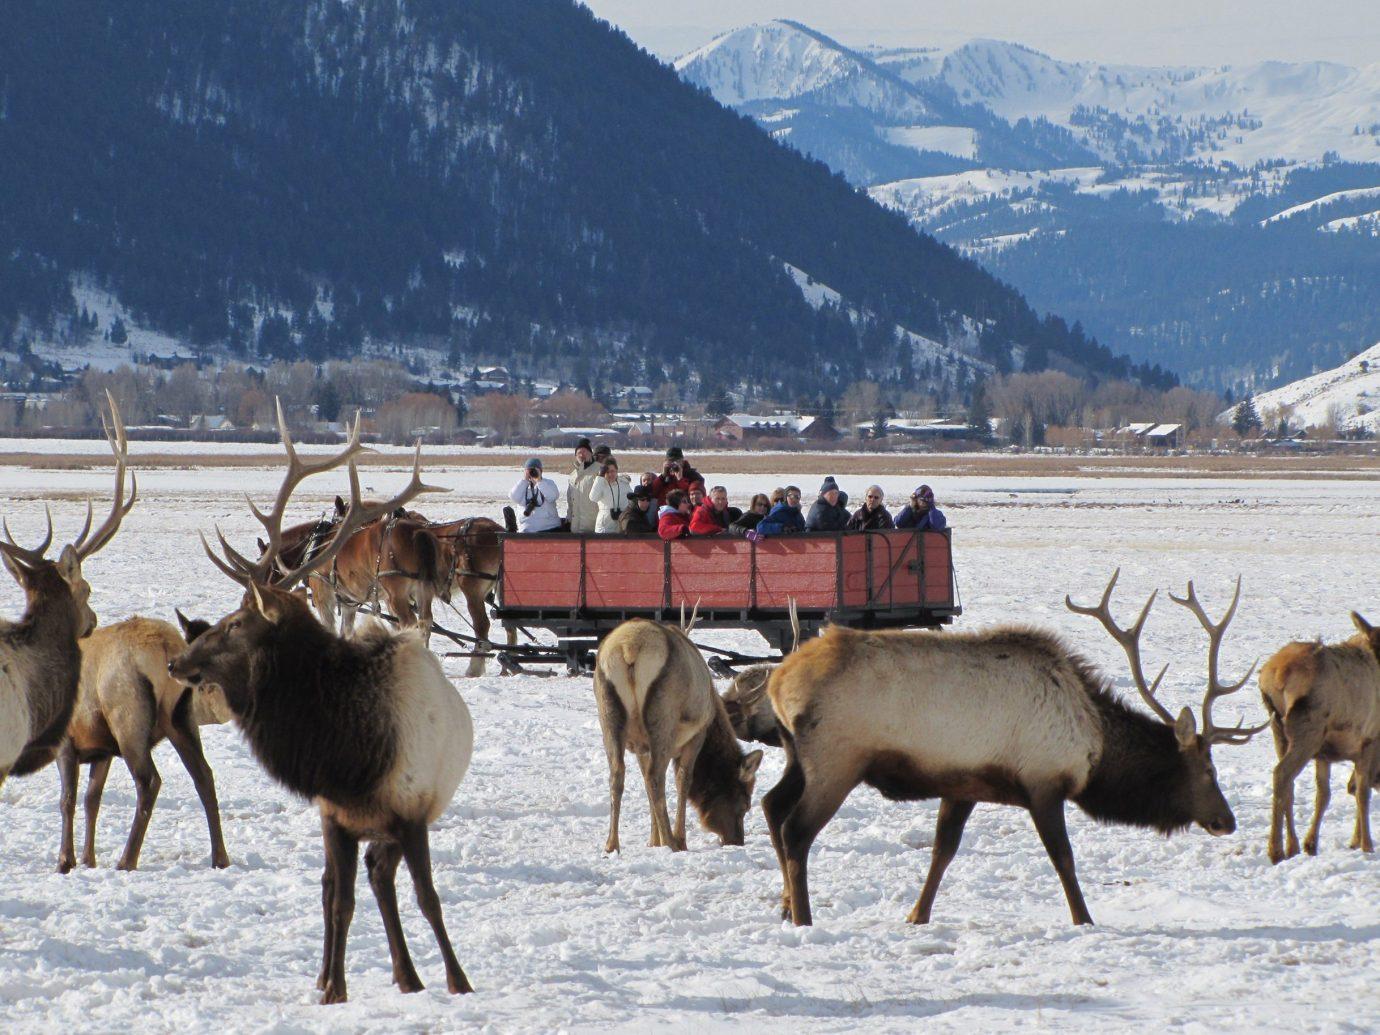 Offbeat Trip Ideas mountain outdoor ground mammal animal deer snow elk Winter herd Wildlife reindeer season group pack animal tundra cattle